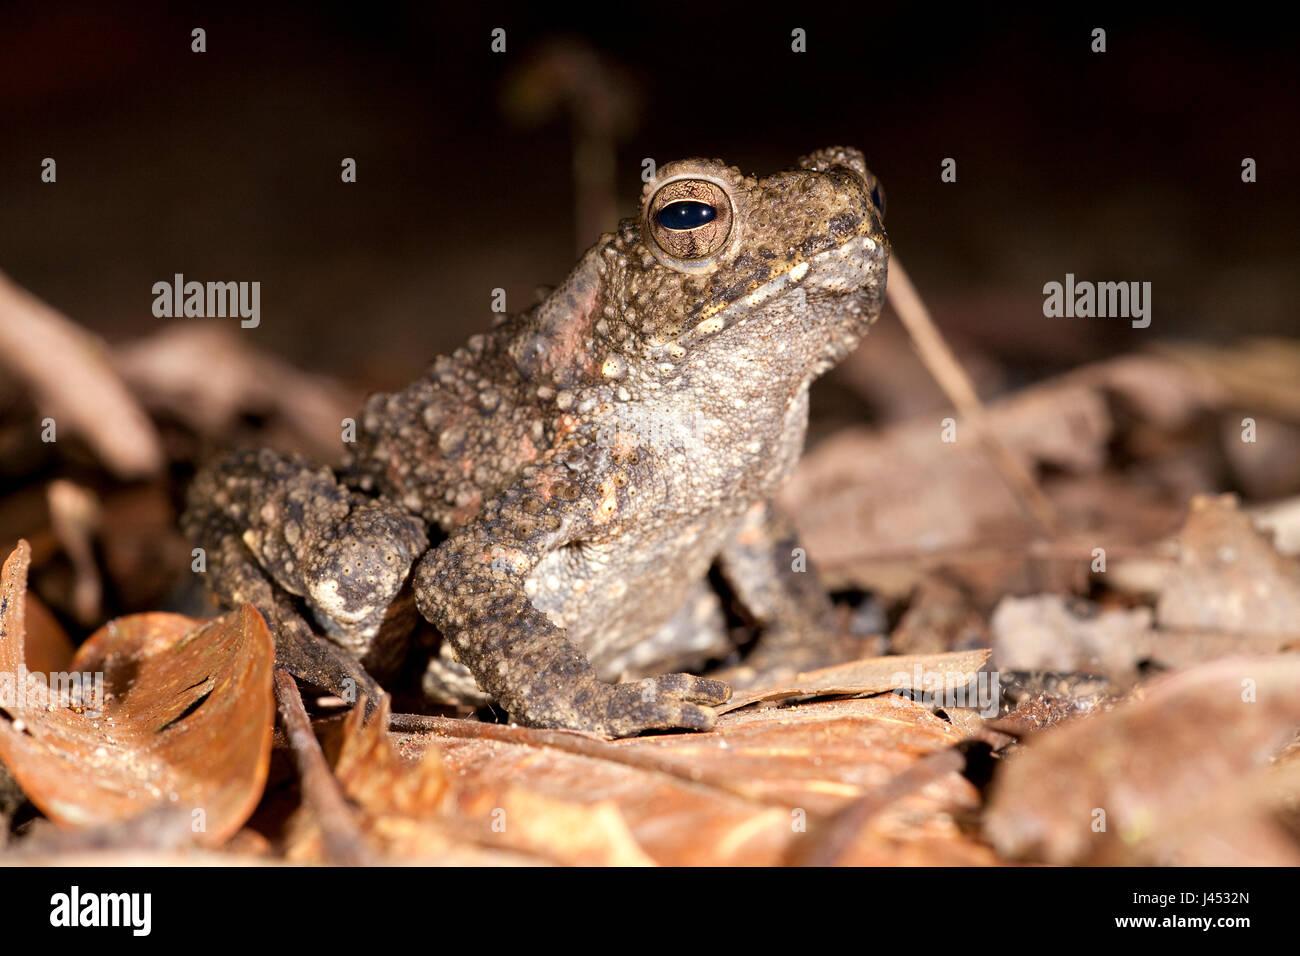 Foto van een enorme pad (Bufo Juxtasper); photo of the enormous giant river toad; - Stock Image